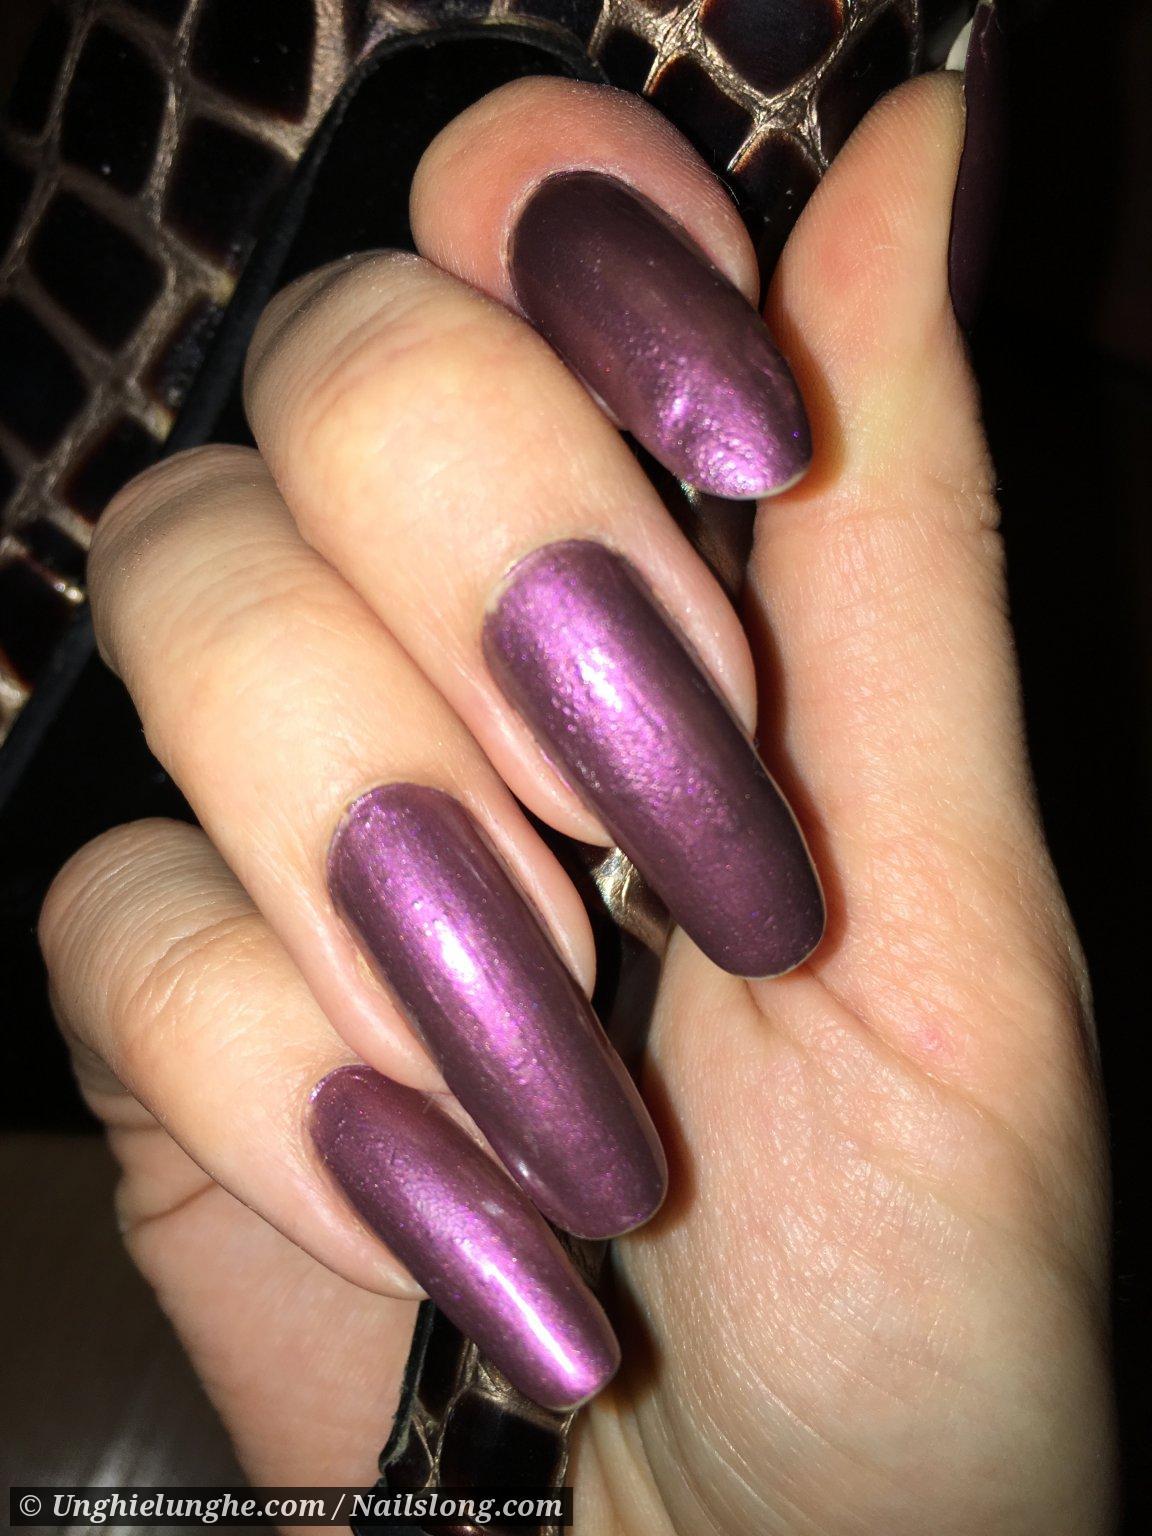 LadyDream - Nailslong.com